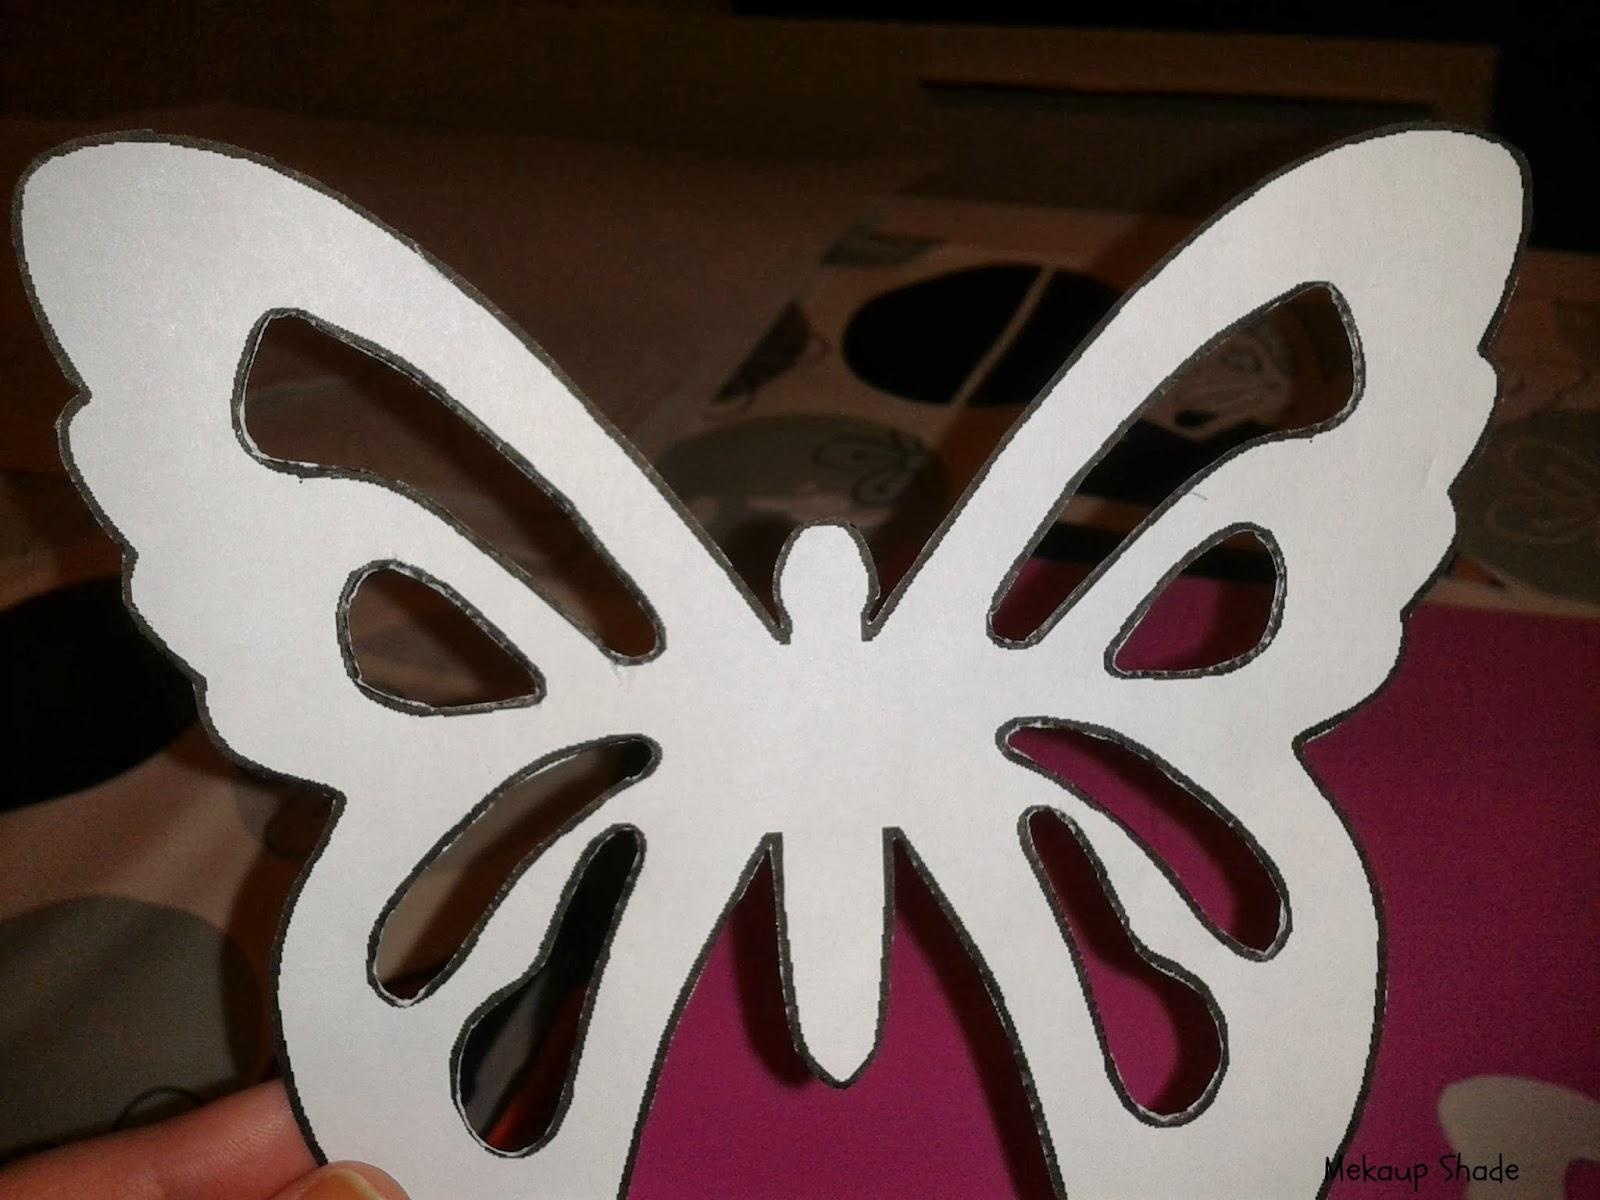 Plantillas para pintar paredes de mariposas imagui - Plantillas de mariposas para pintar ...